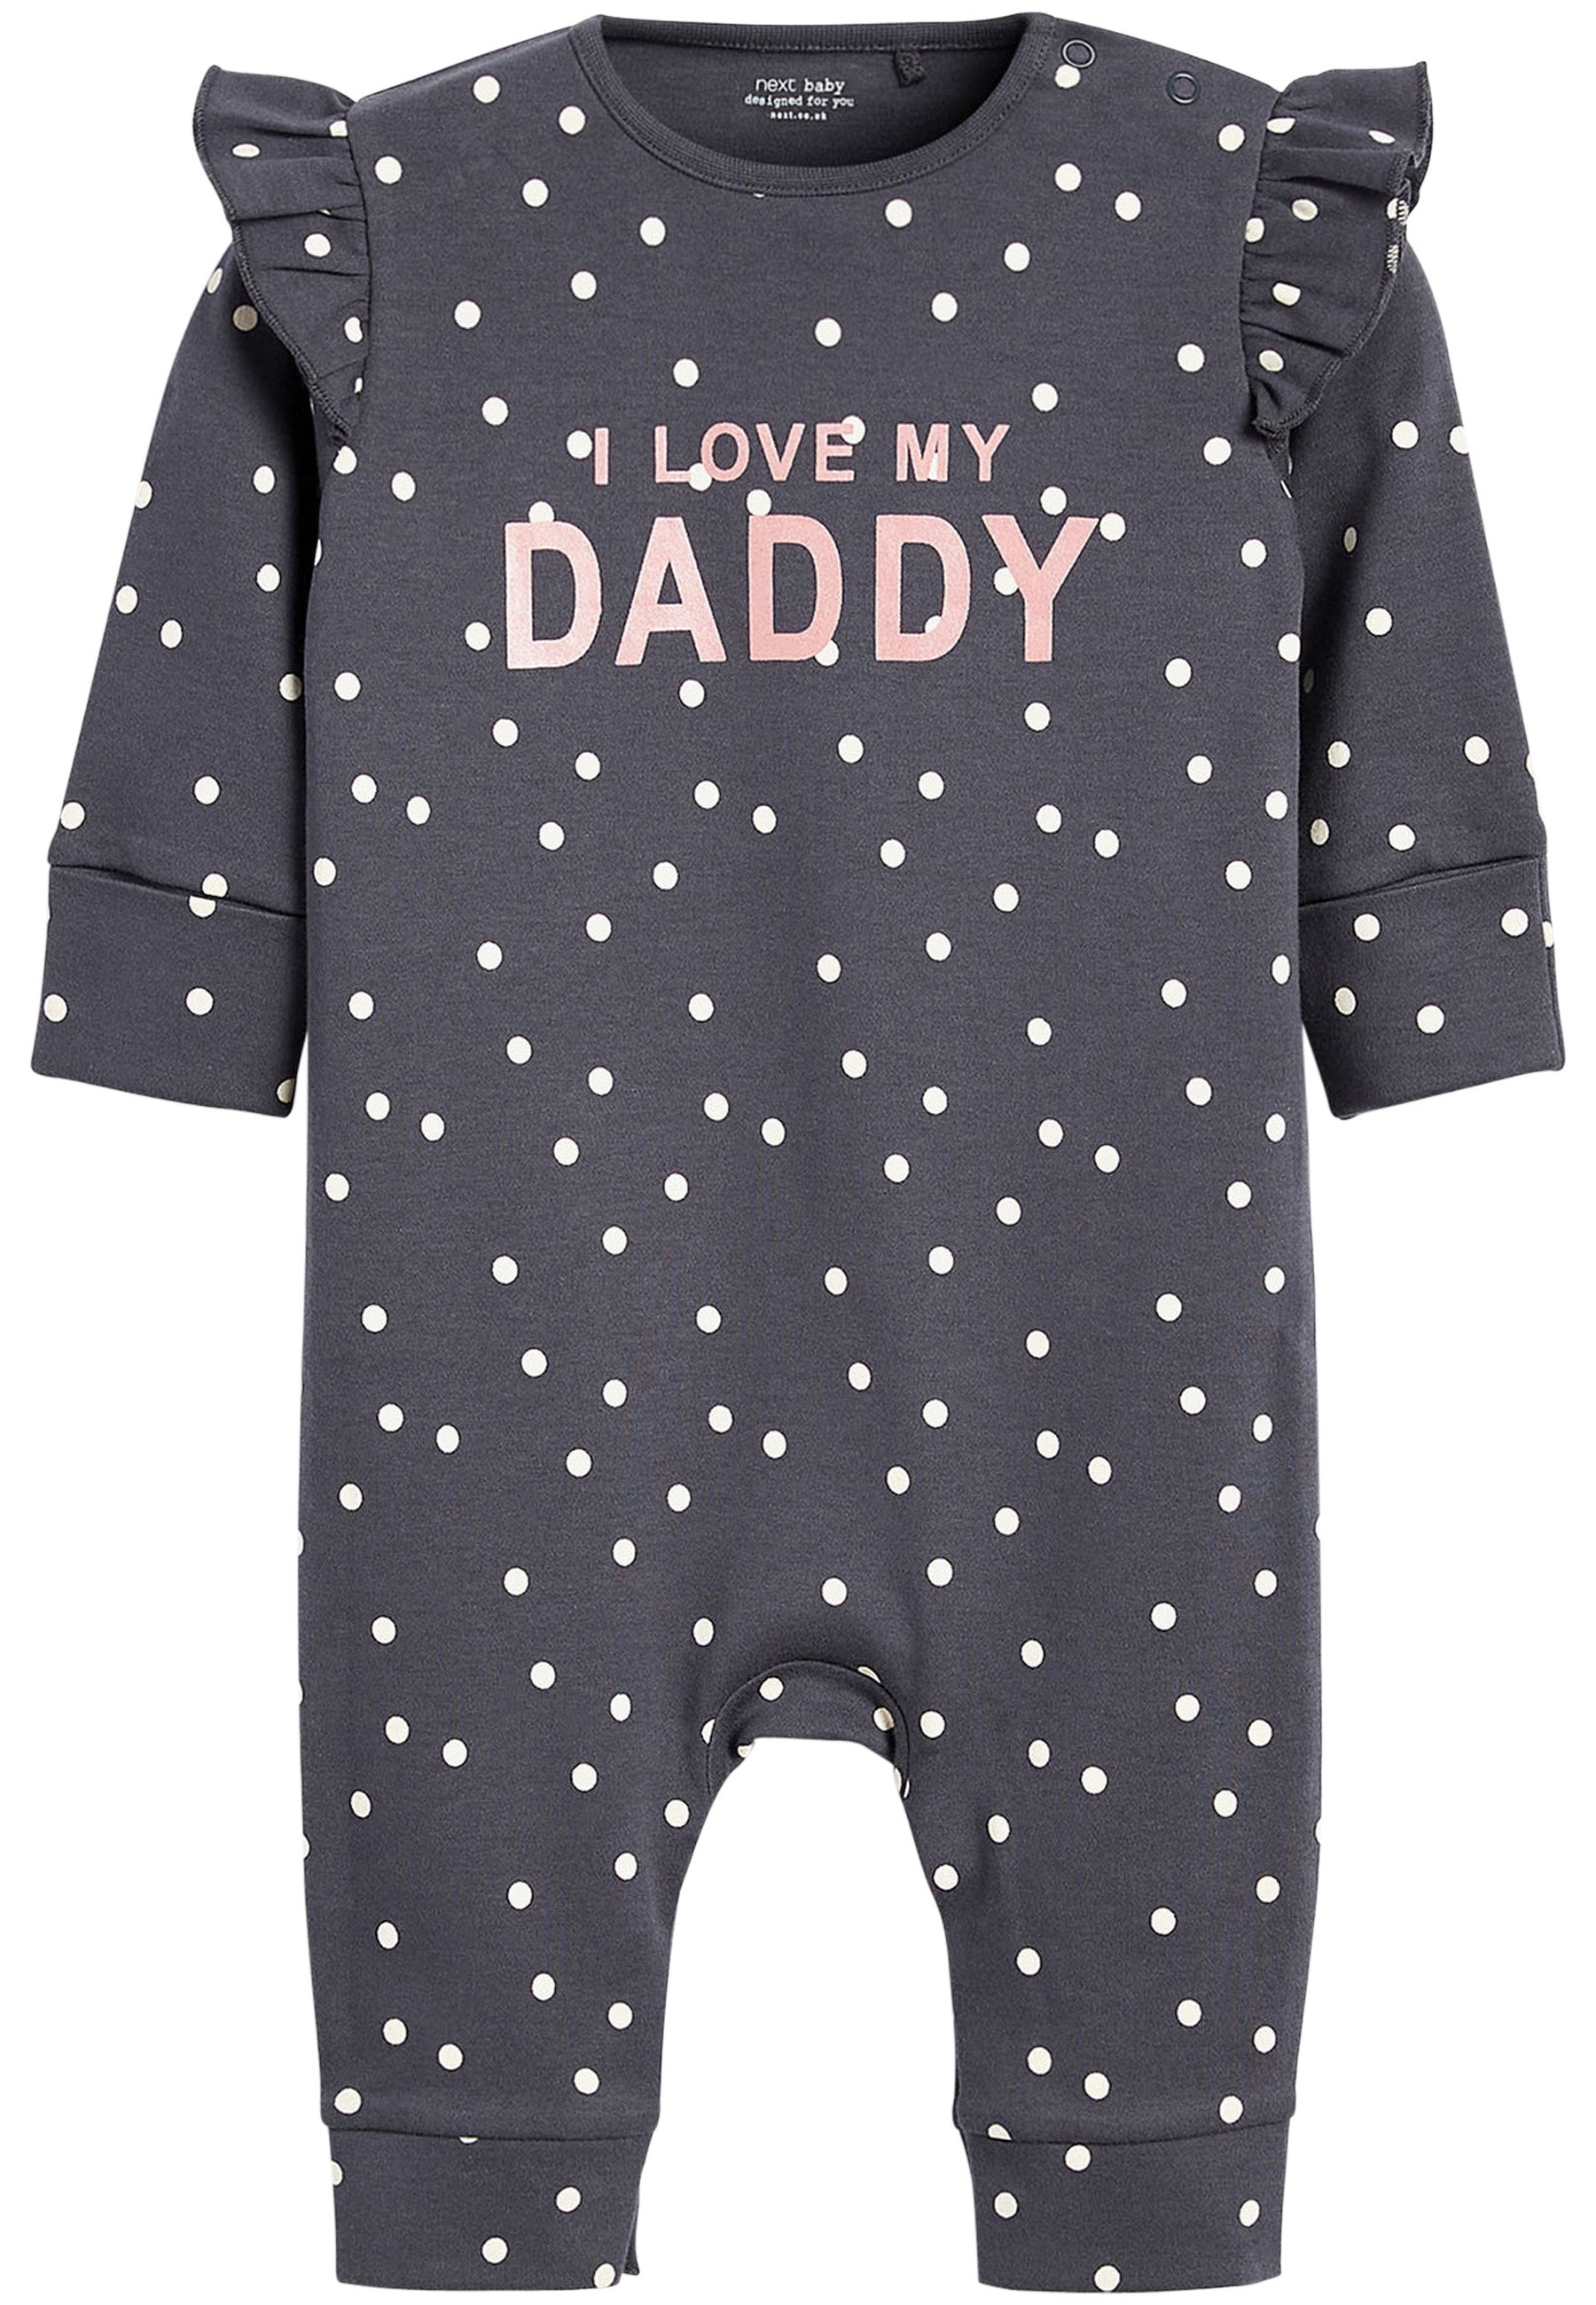 Niño I LOVE MY DADDY - Pijama